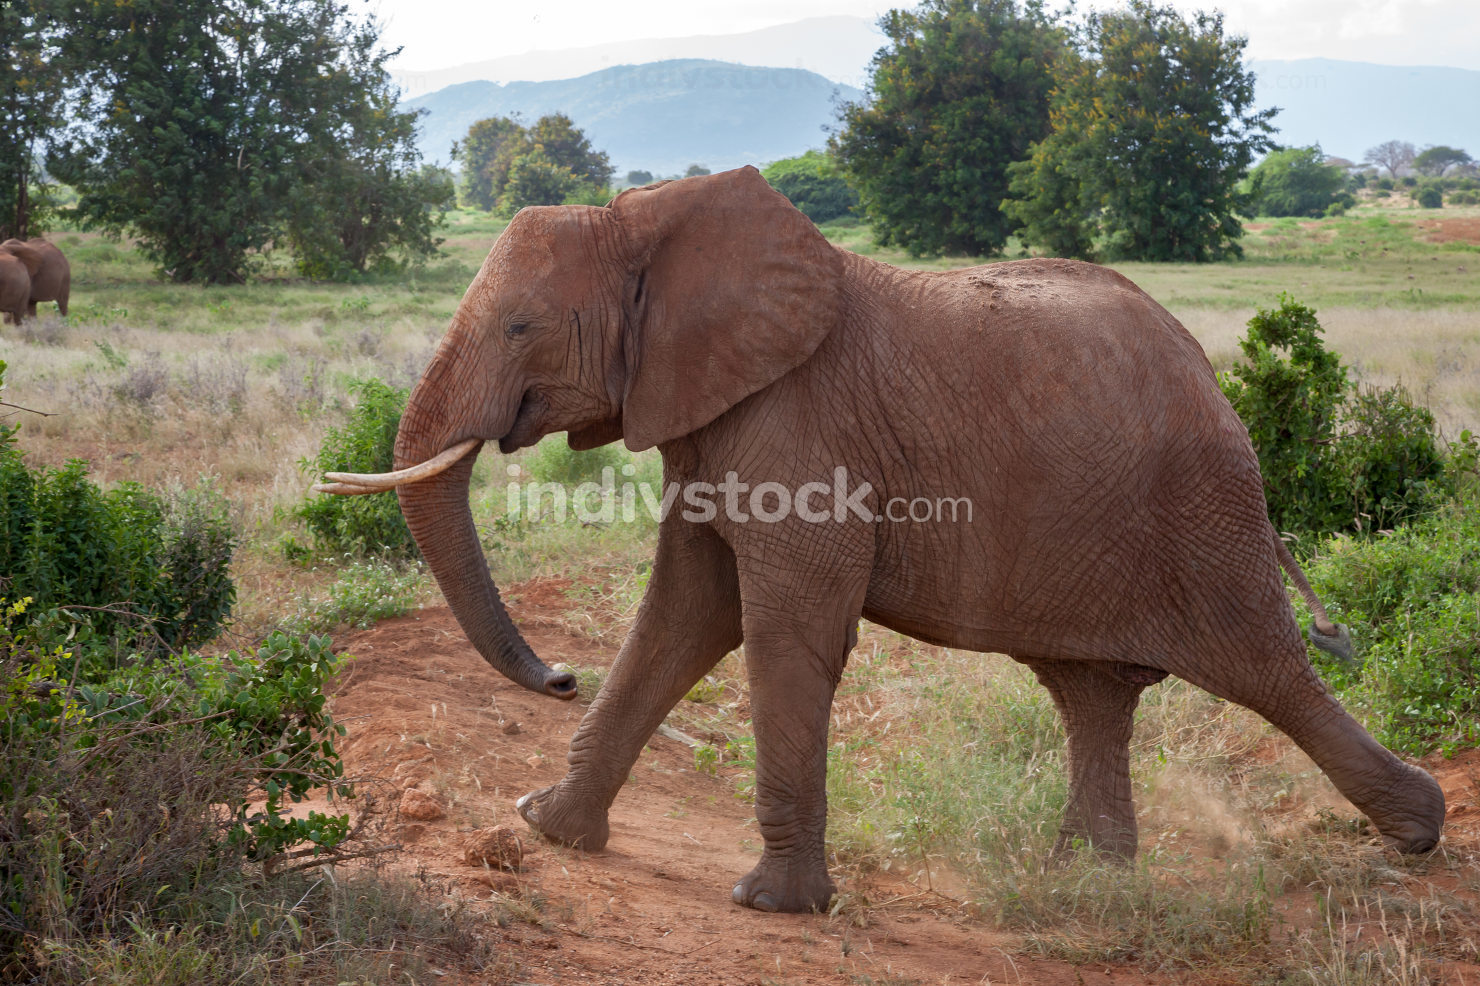 A big elephant is walking in the savannah